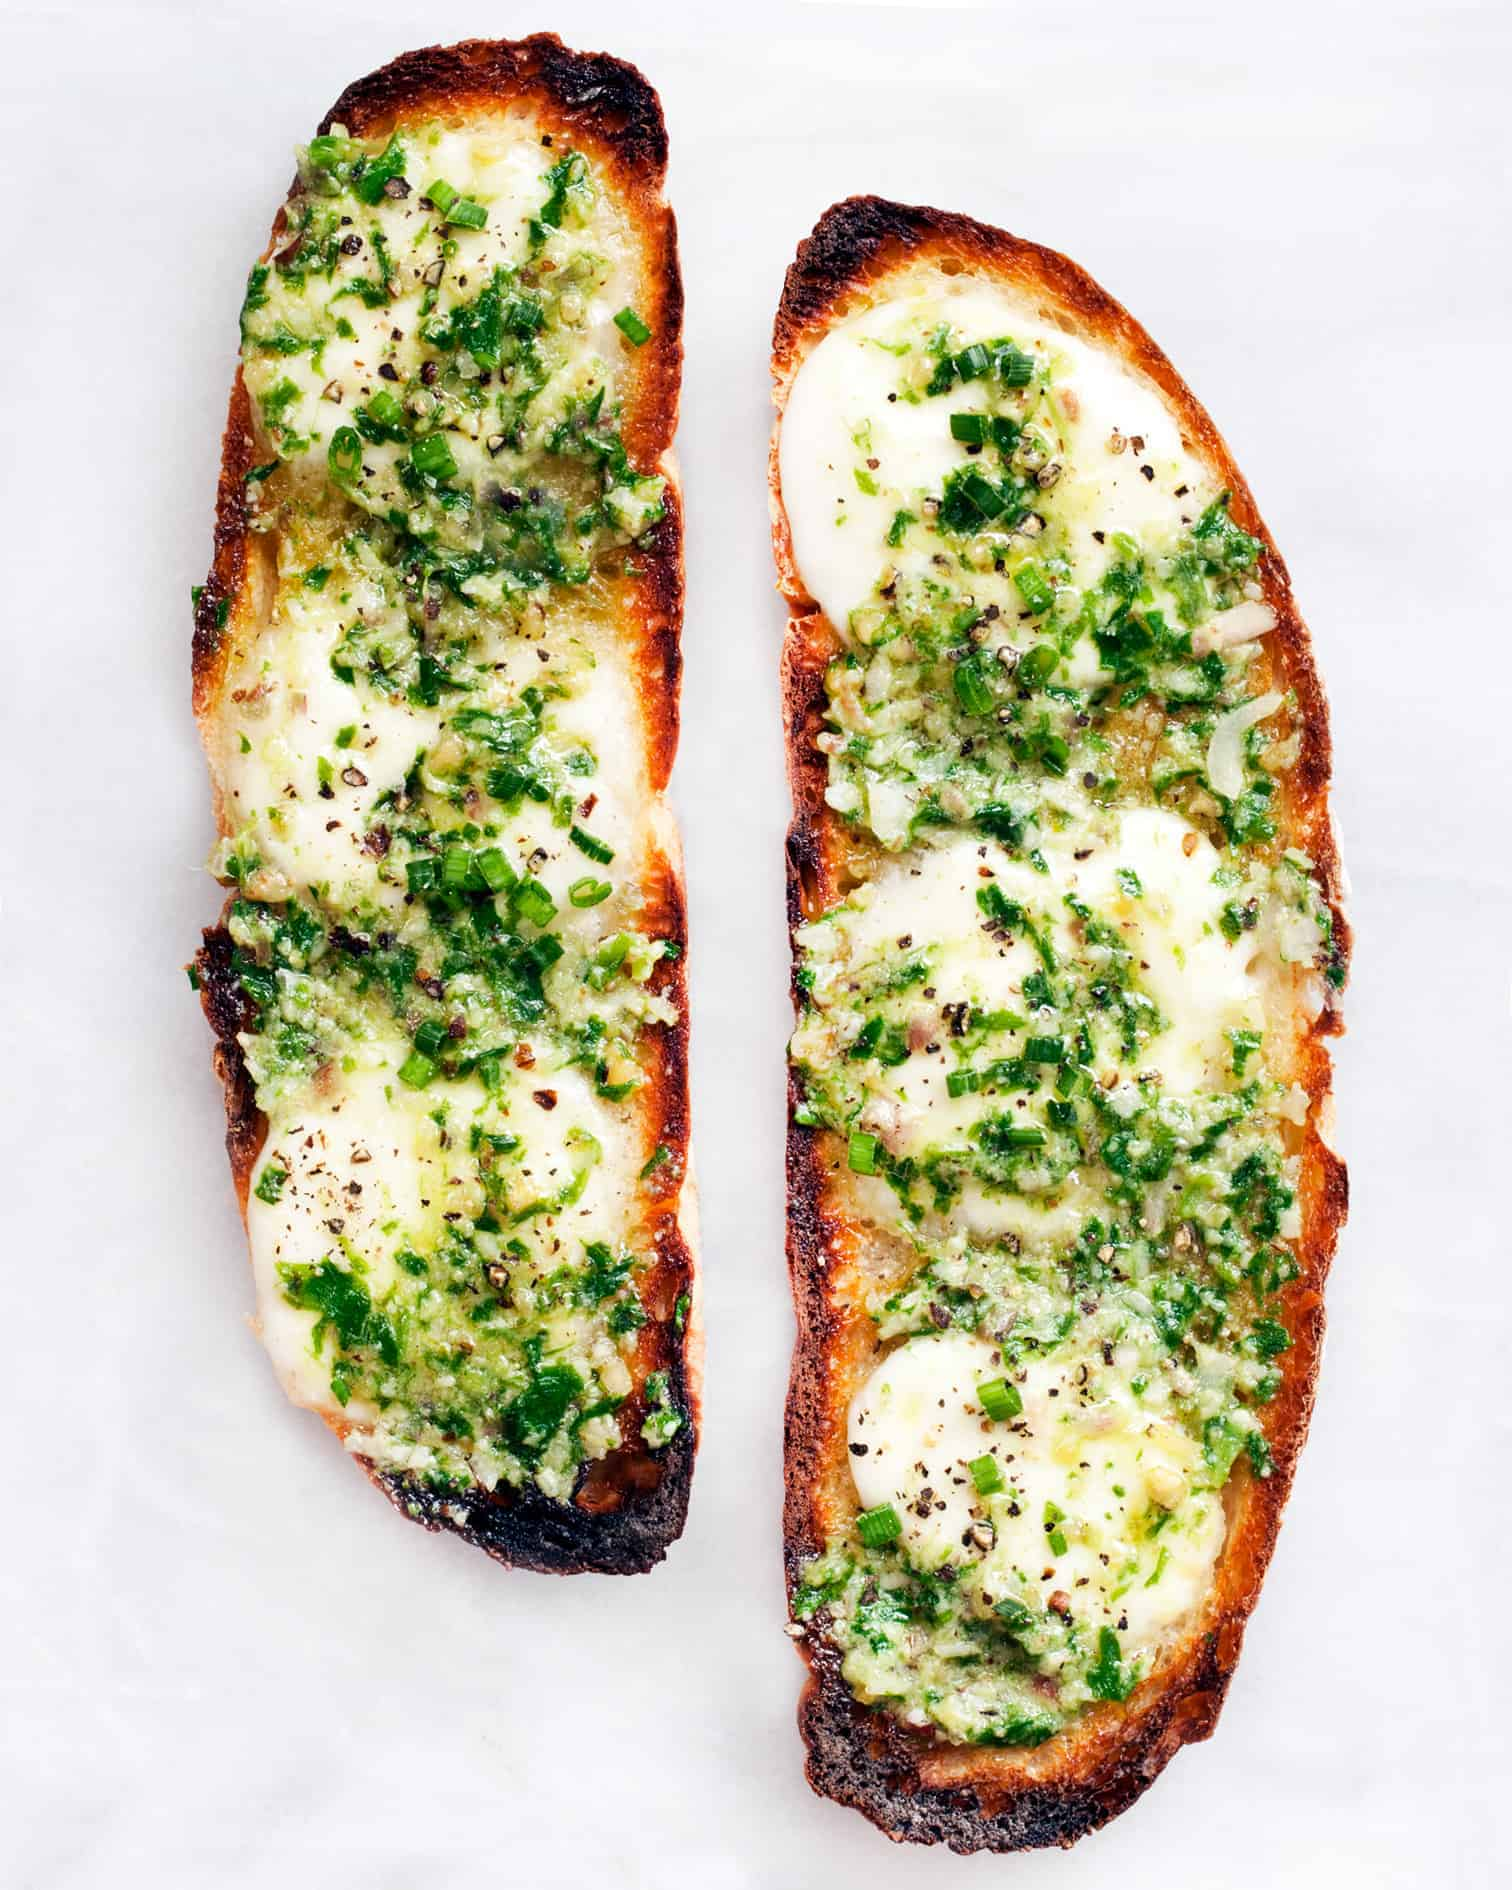 Ramp Garlic Bread